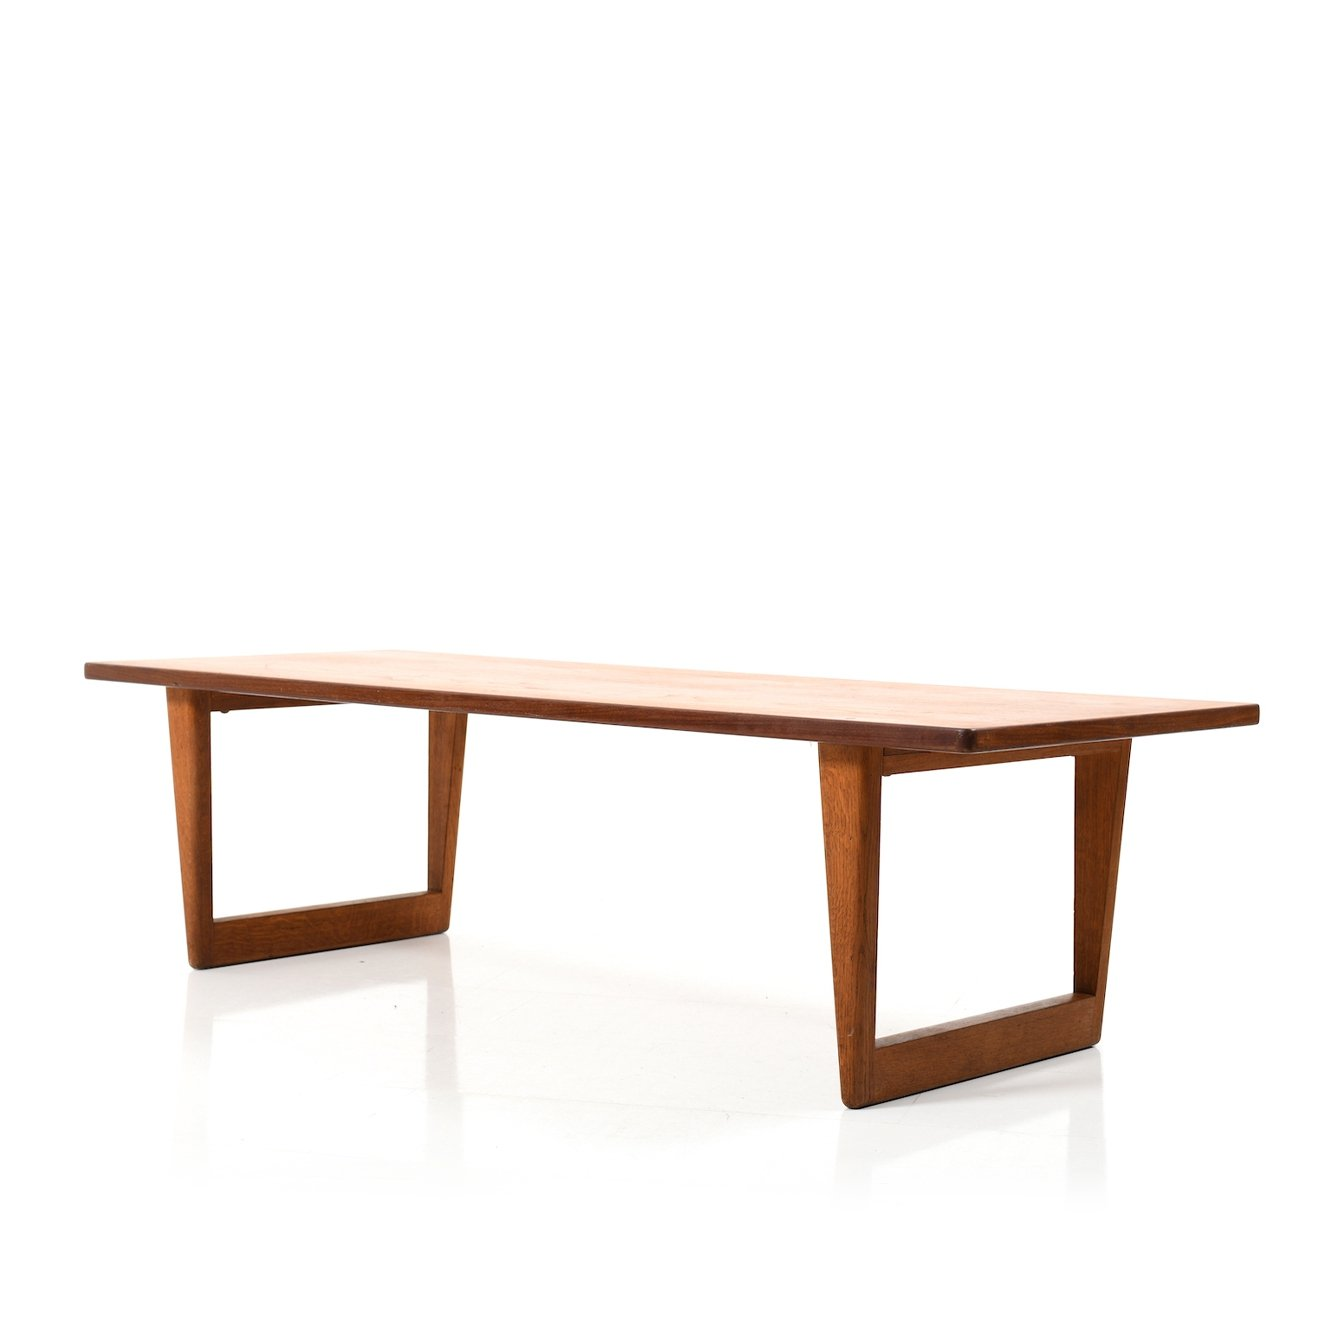 Danish Teak Oak Sofa Table By Borge Mogensen For Fredericia Furniture 1950s 114742